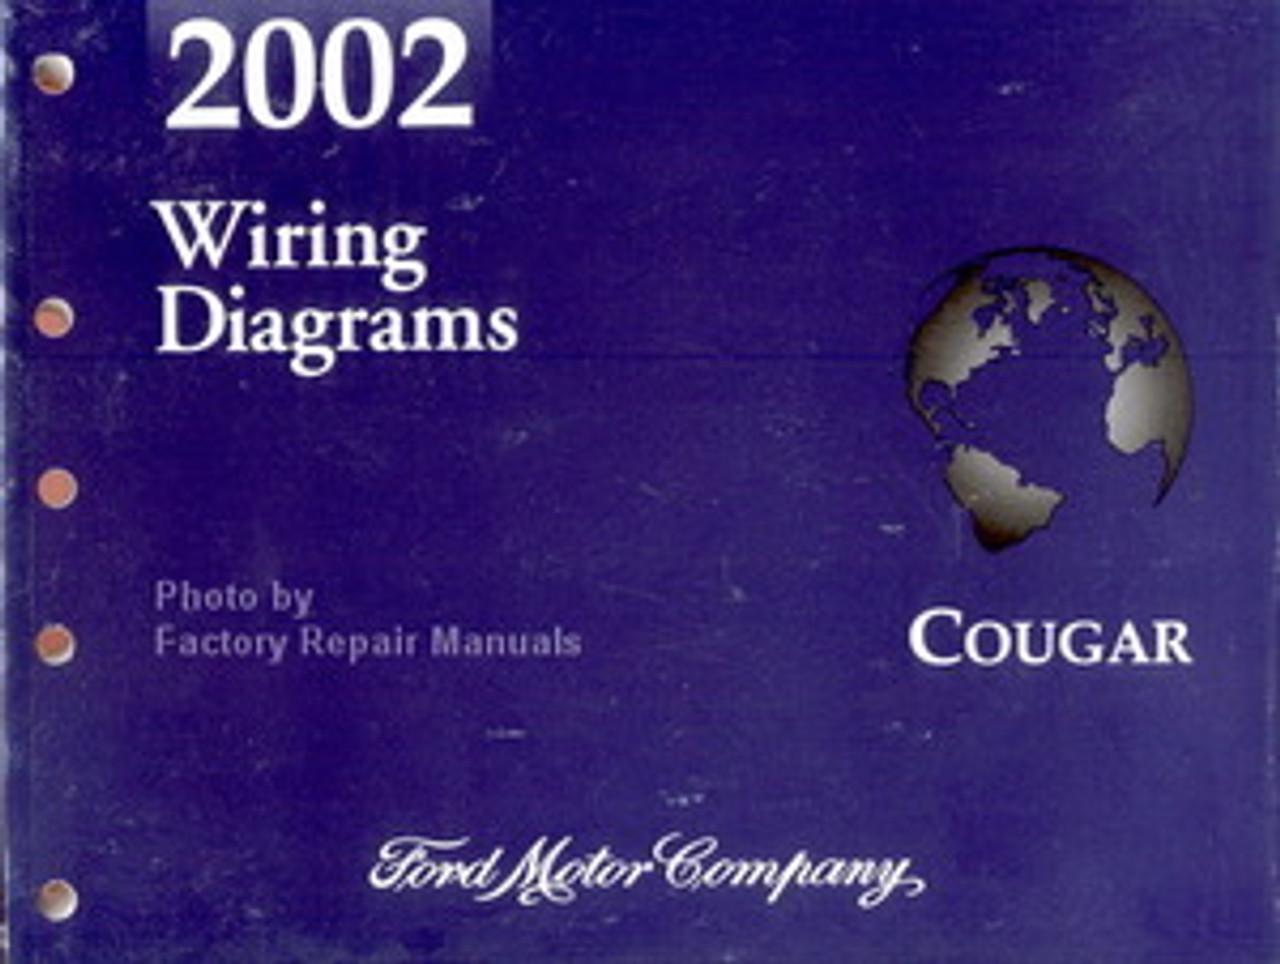 2002 mercury cougar electrical wiring diagrams original ford manual wiring diagram 2002 mercury cougar 2002 mercury cougar wiring diagram #4